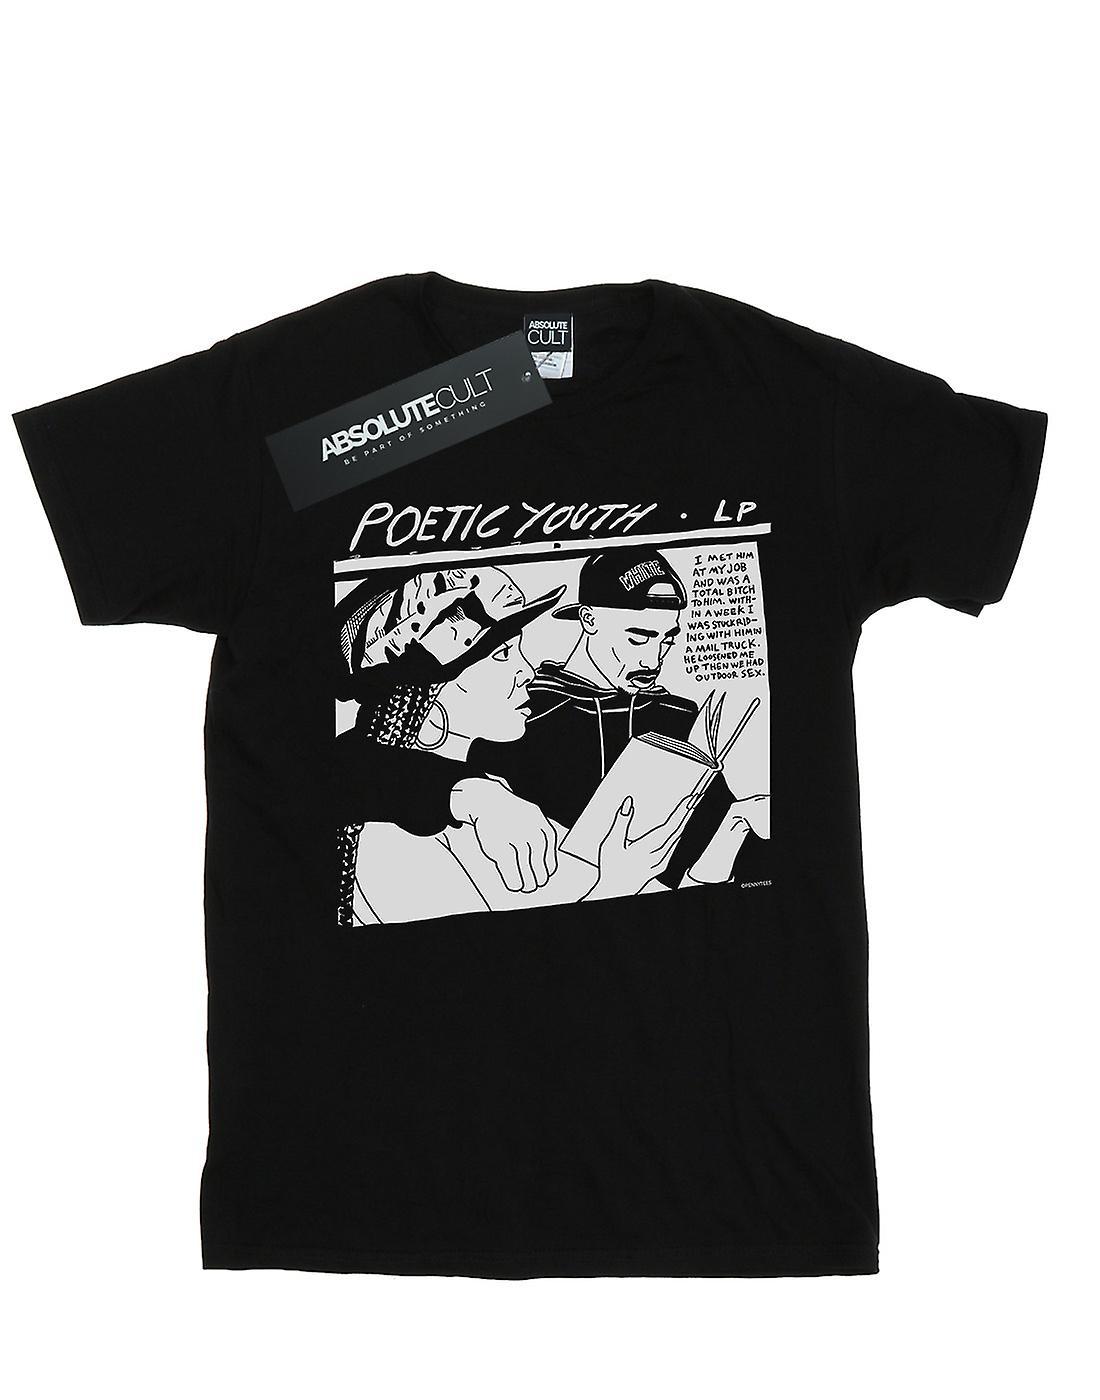 Pennytees Women's Poetic Youth Boyfriend Fit T-Shirt